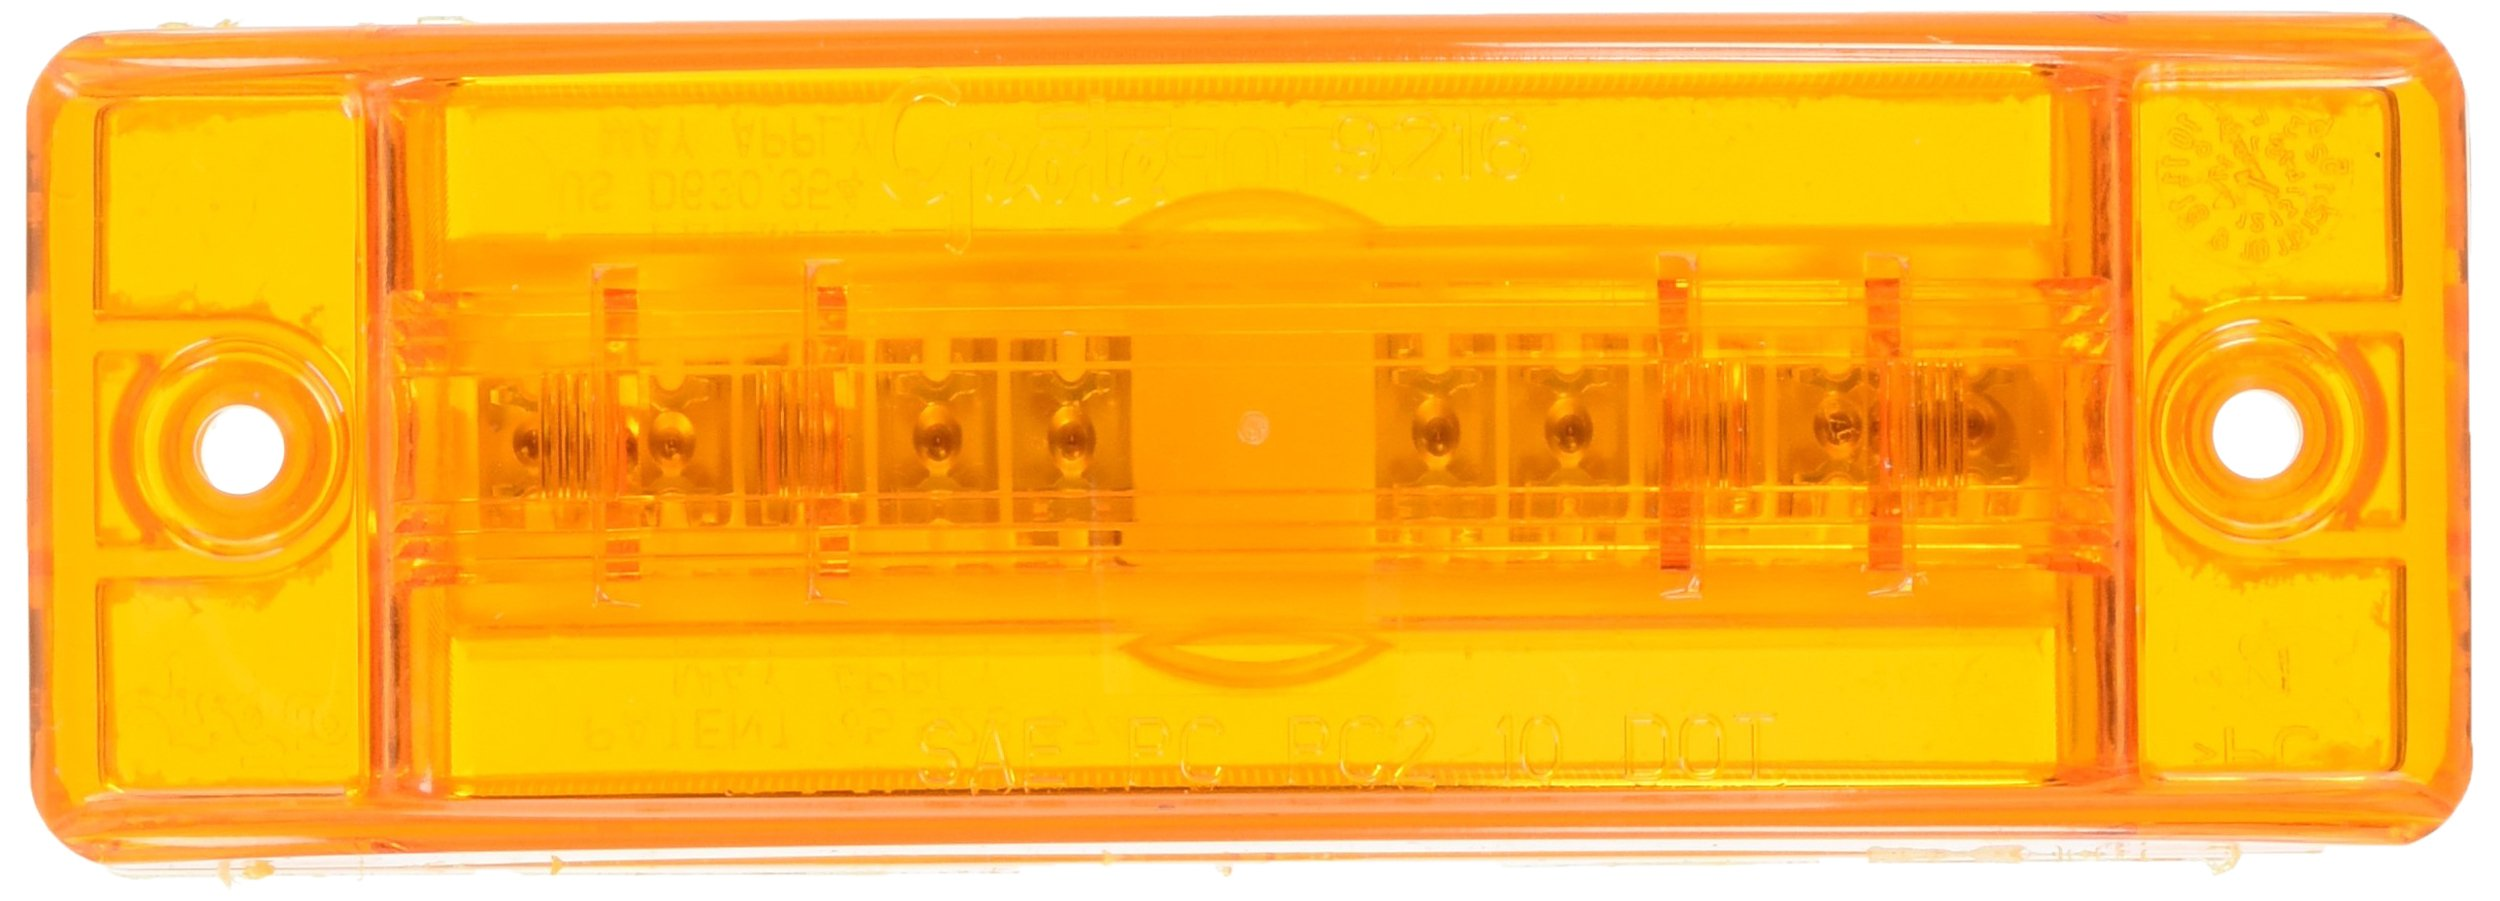 Grote 54003 SuperNova Sealed Turtleback II LED Clearance Marker Light by Grote